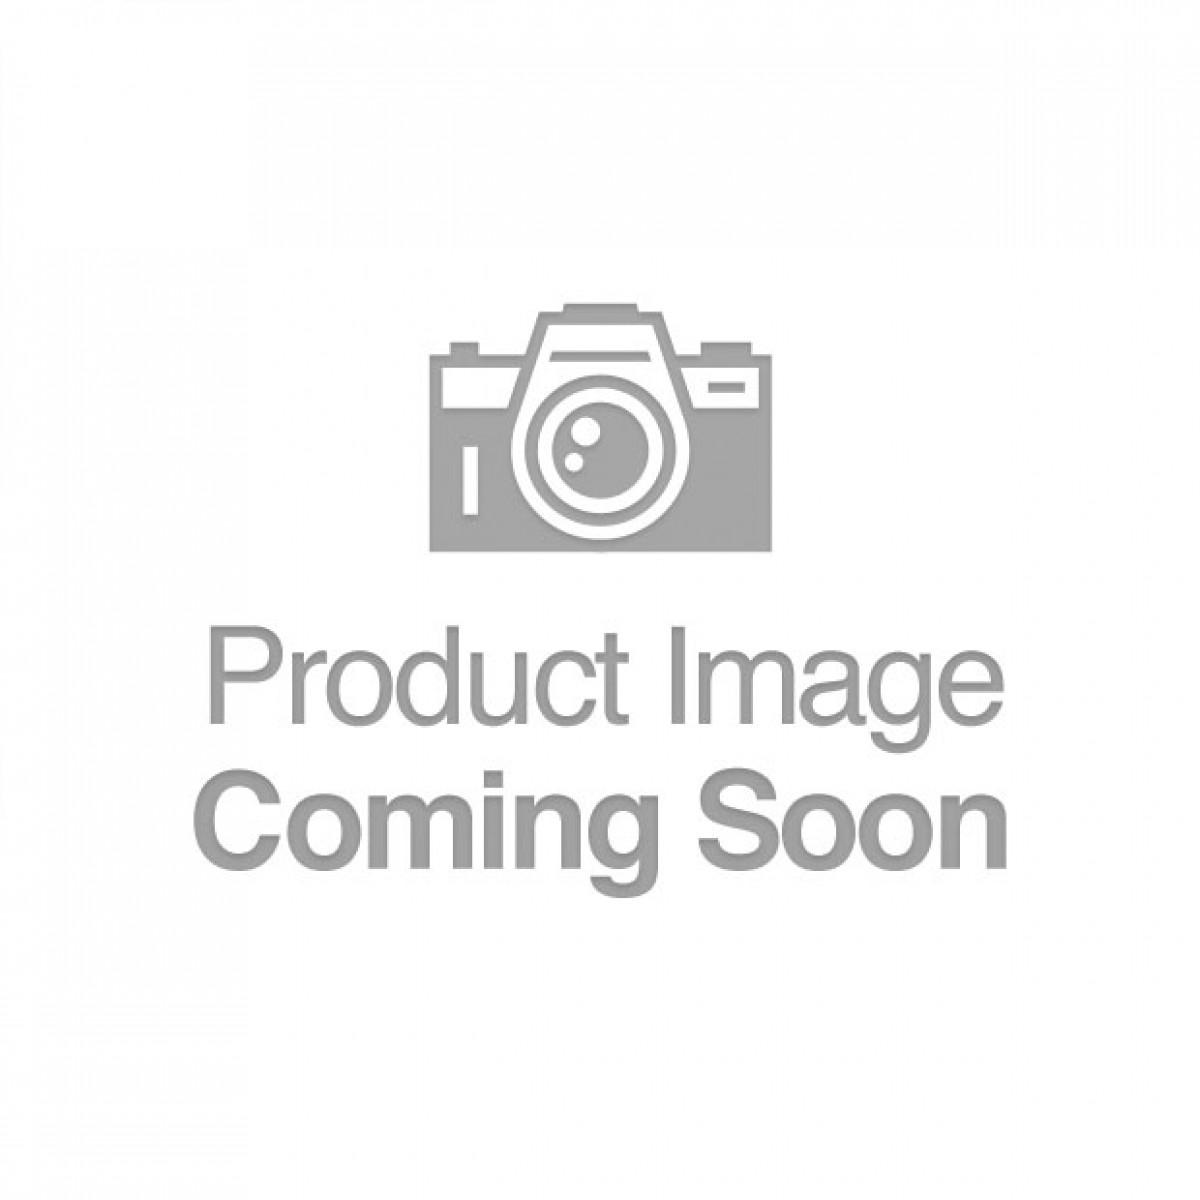 Nexus Revo Extreme Rotating Prostate Massager - Black